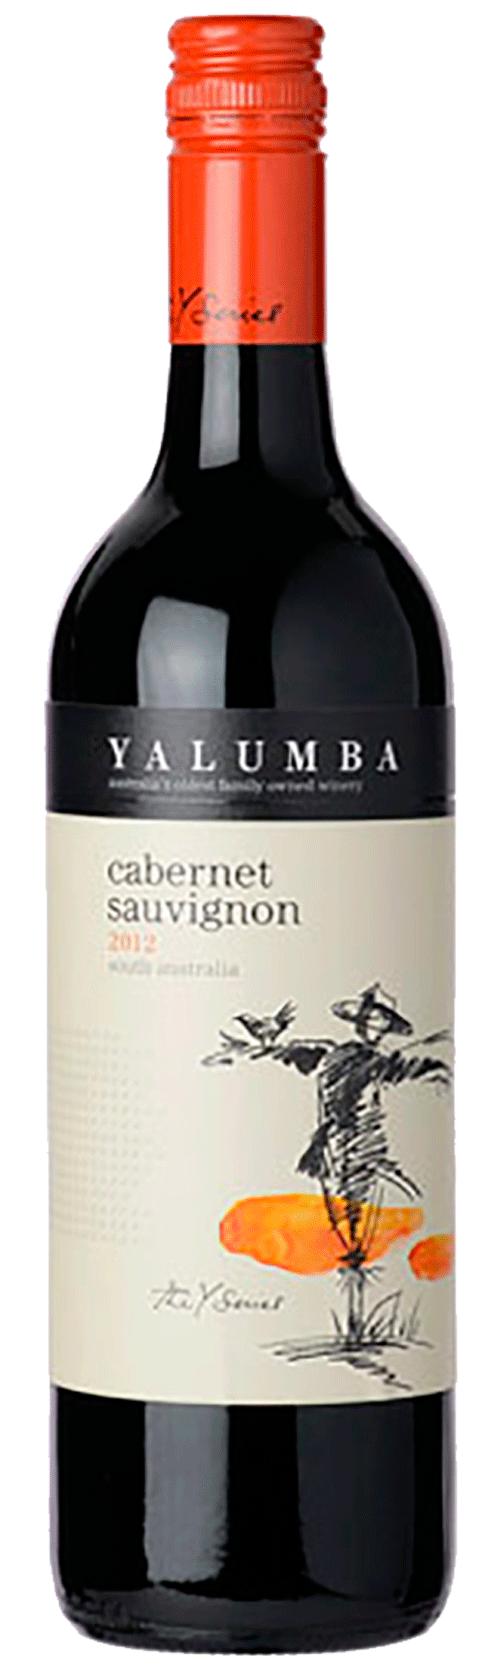 Yalumba Y Series Cabernet Sauvignon 2010